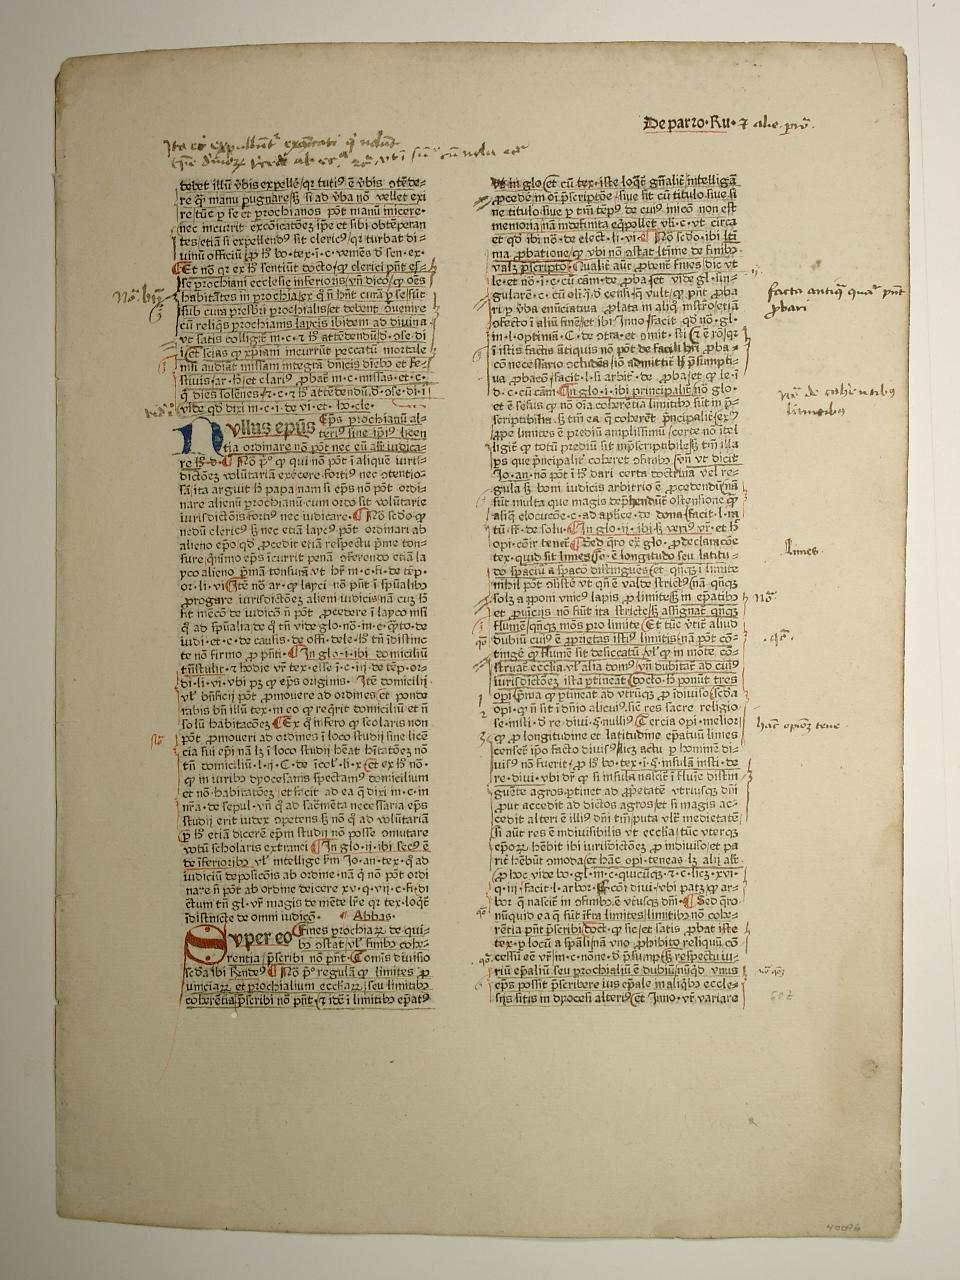 Super libros Decretalium 3. De parto Ru: Nicolaus de Tudeschis: